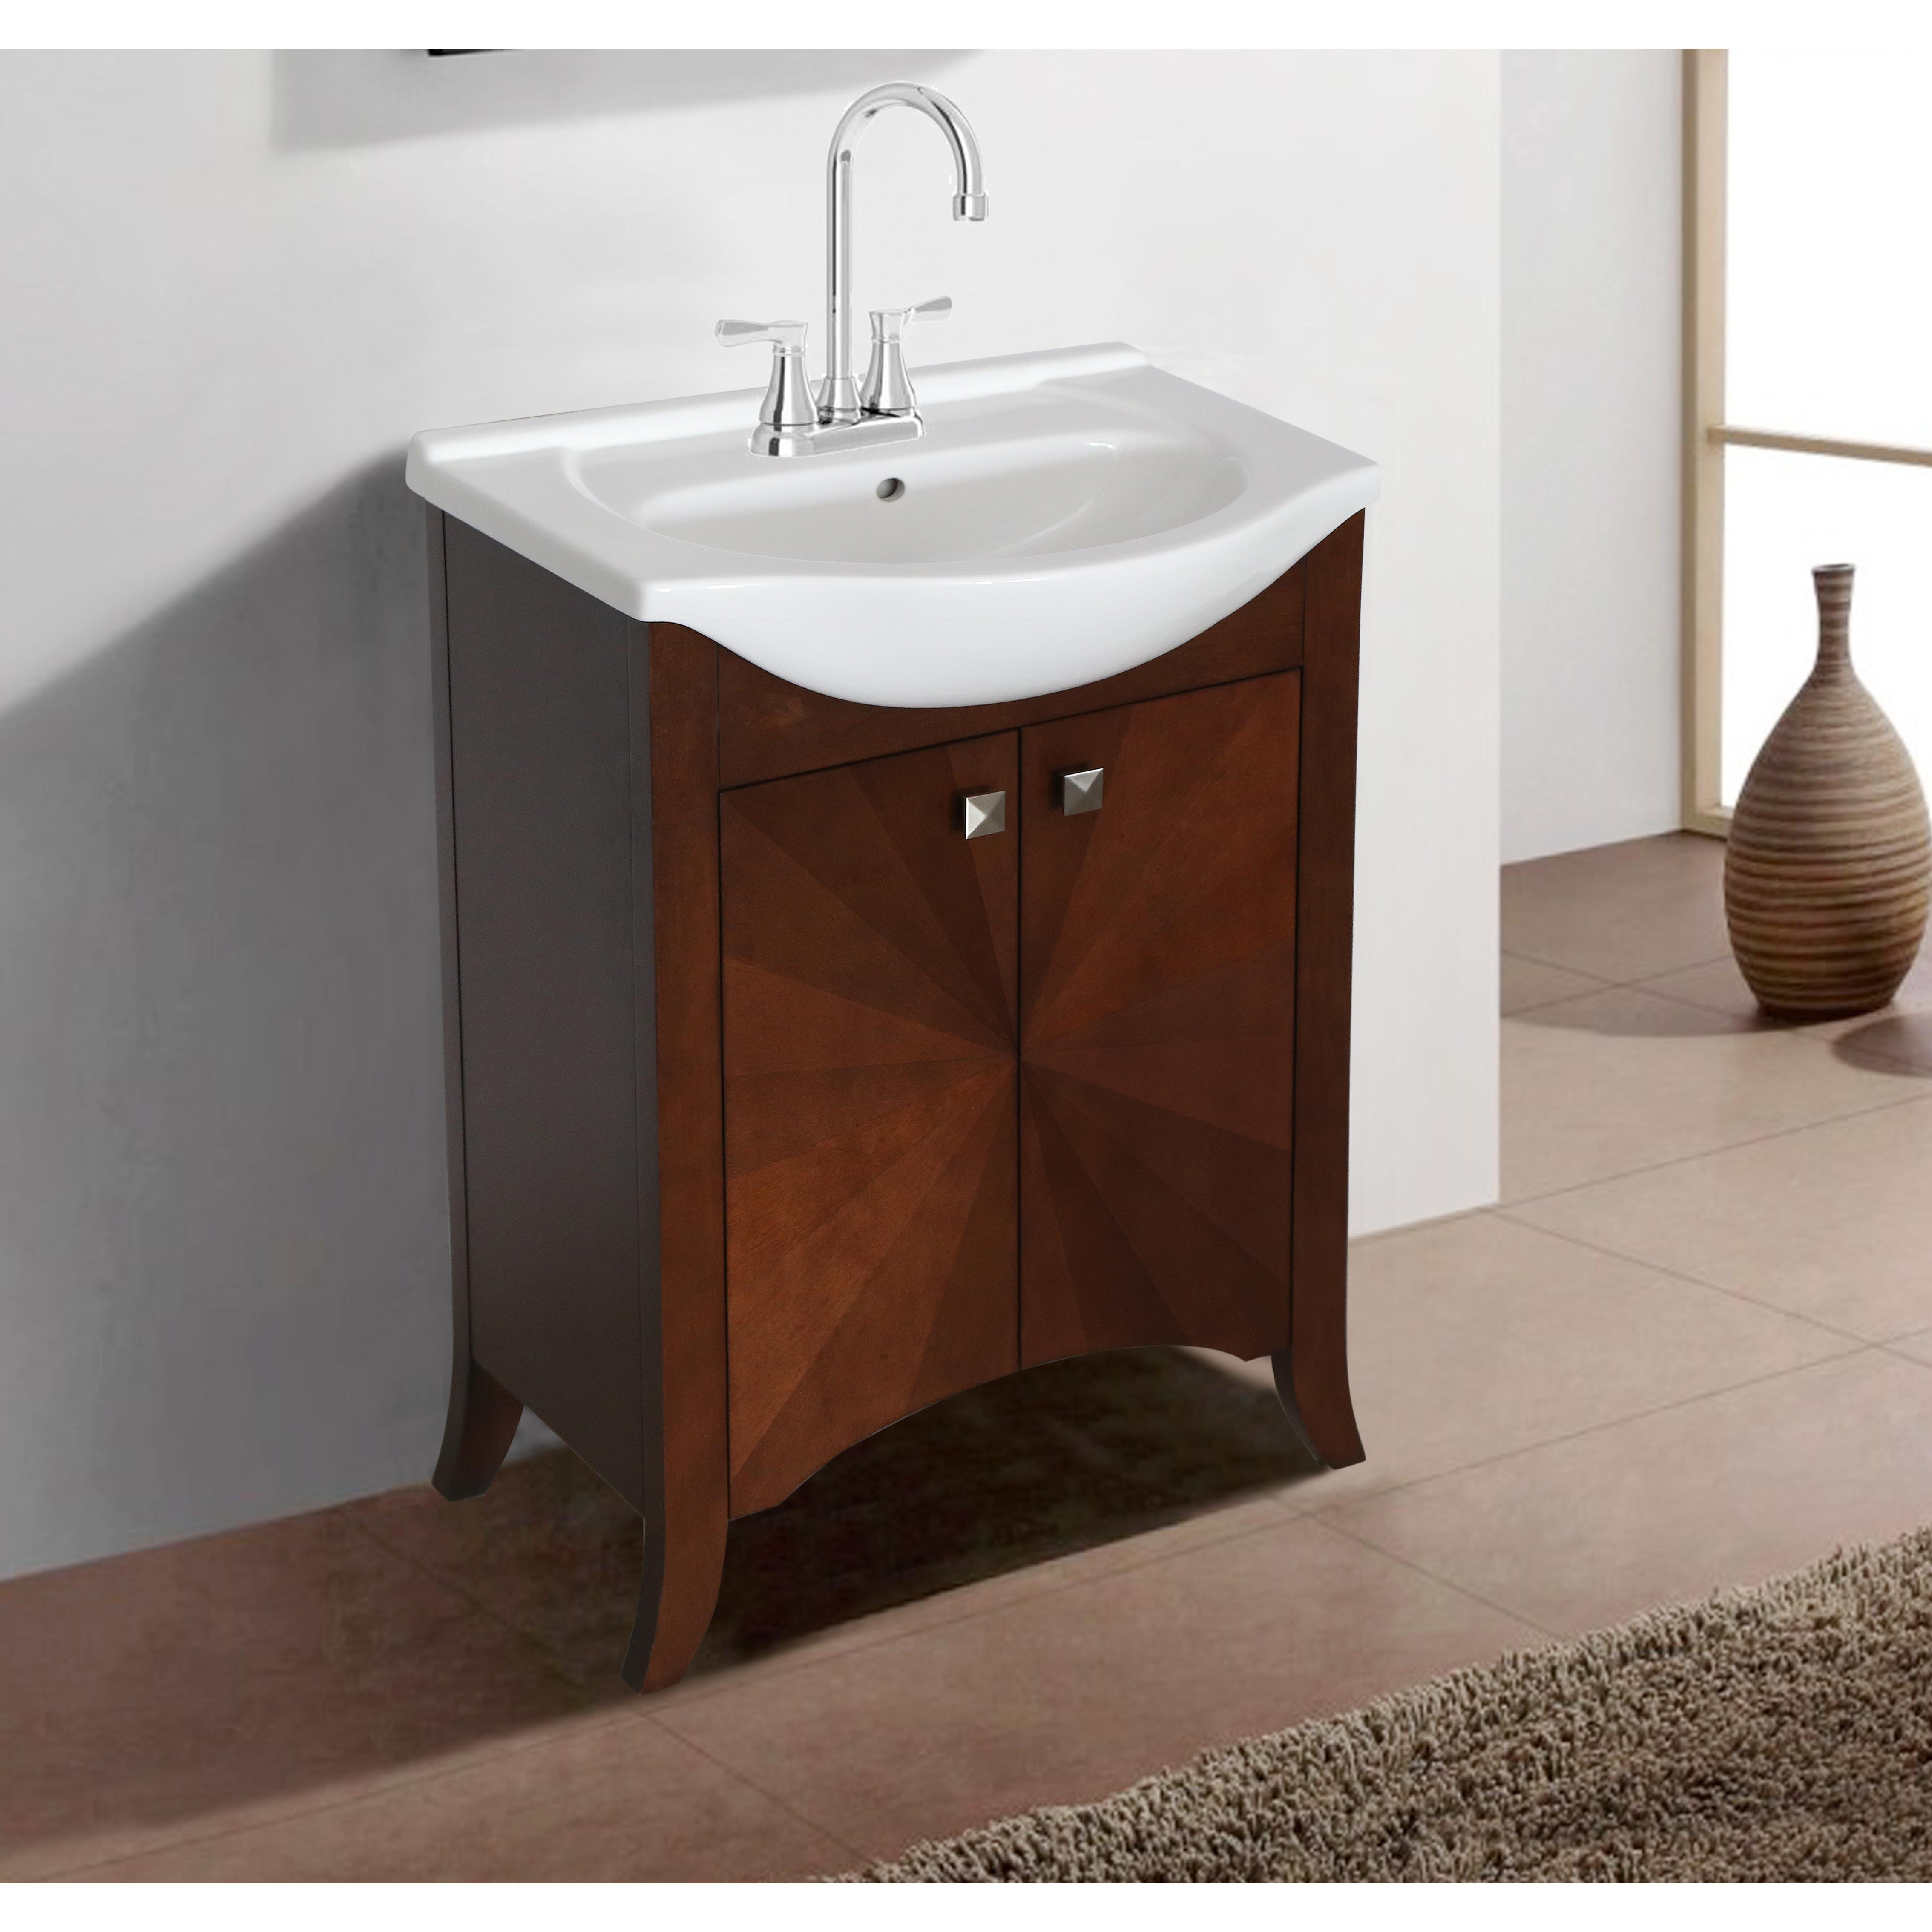 incredible wayfair bathroom sinks construction-Fantastic Wayfair Bathroom Sinks Portrait